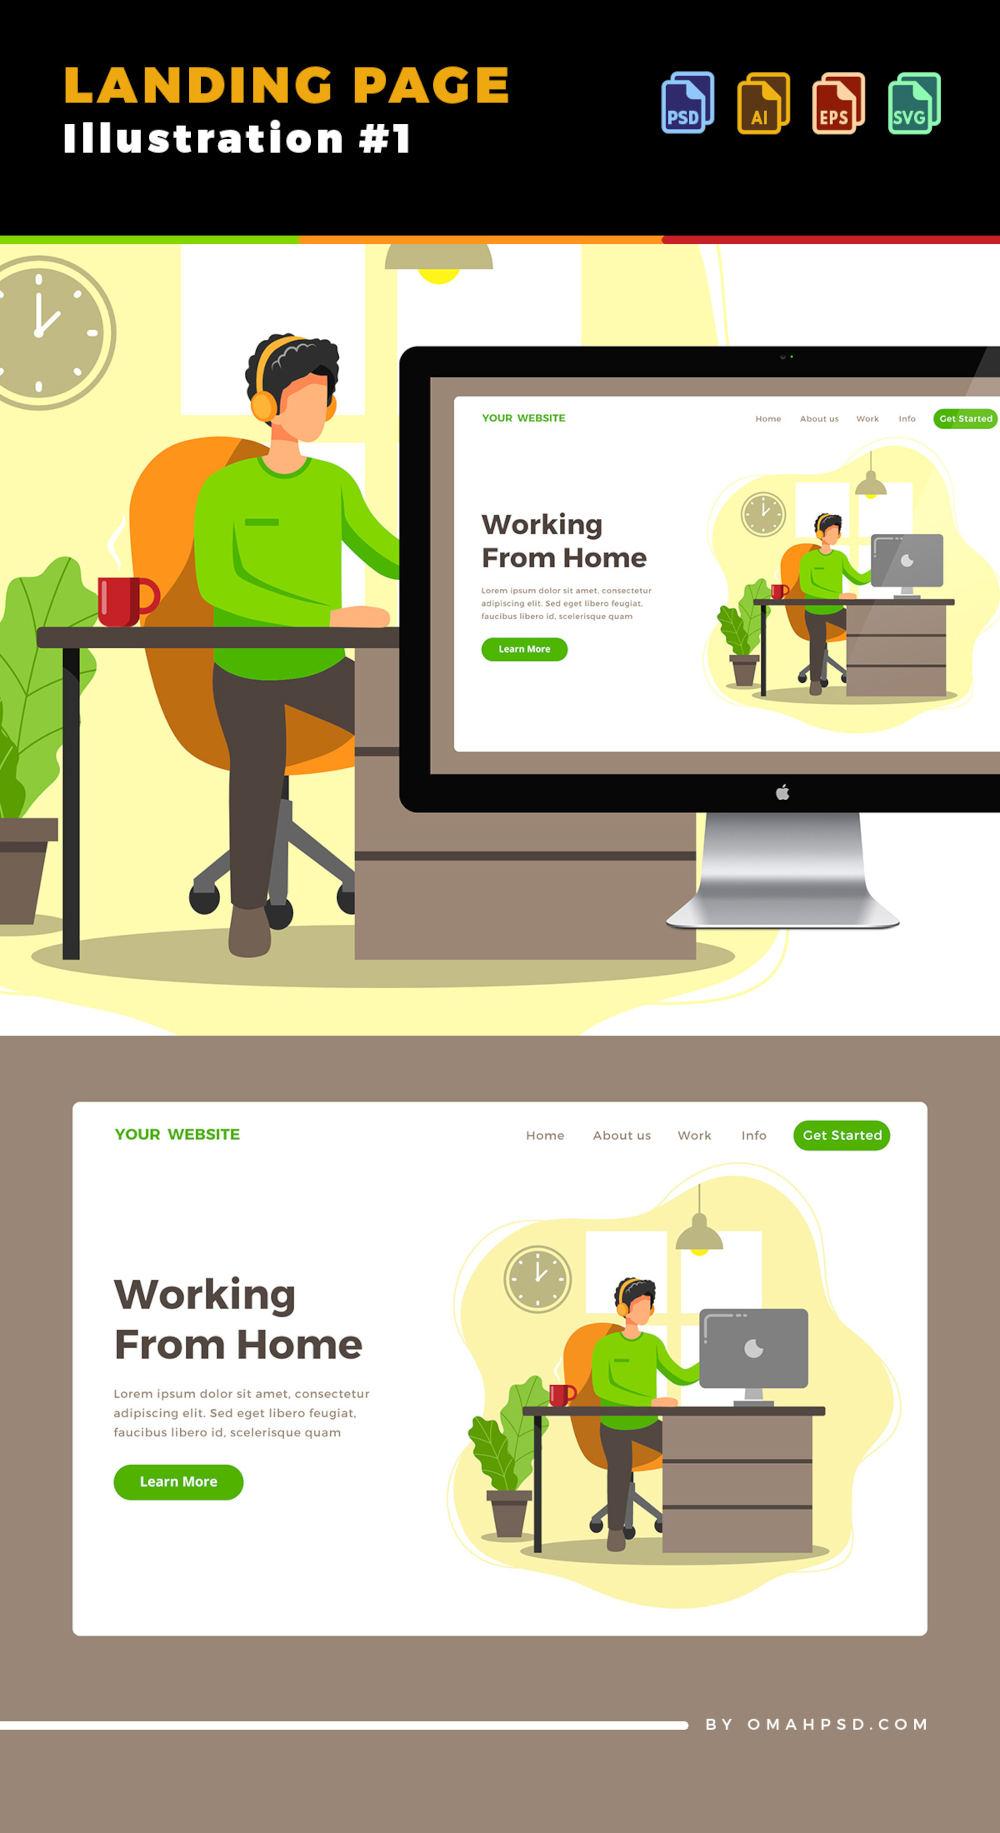 Free WFH Illustrtion Landing Page Template